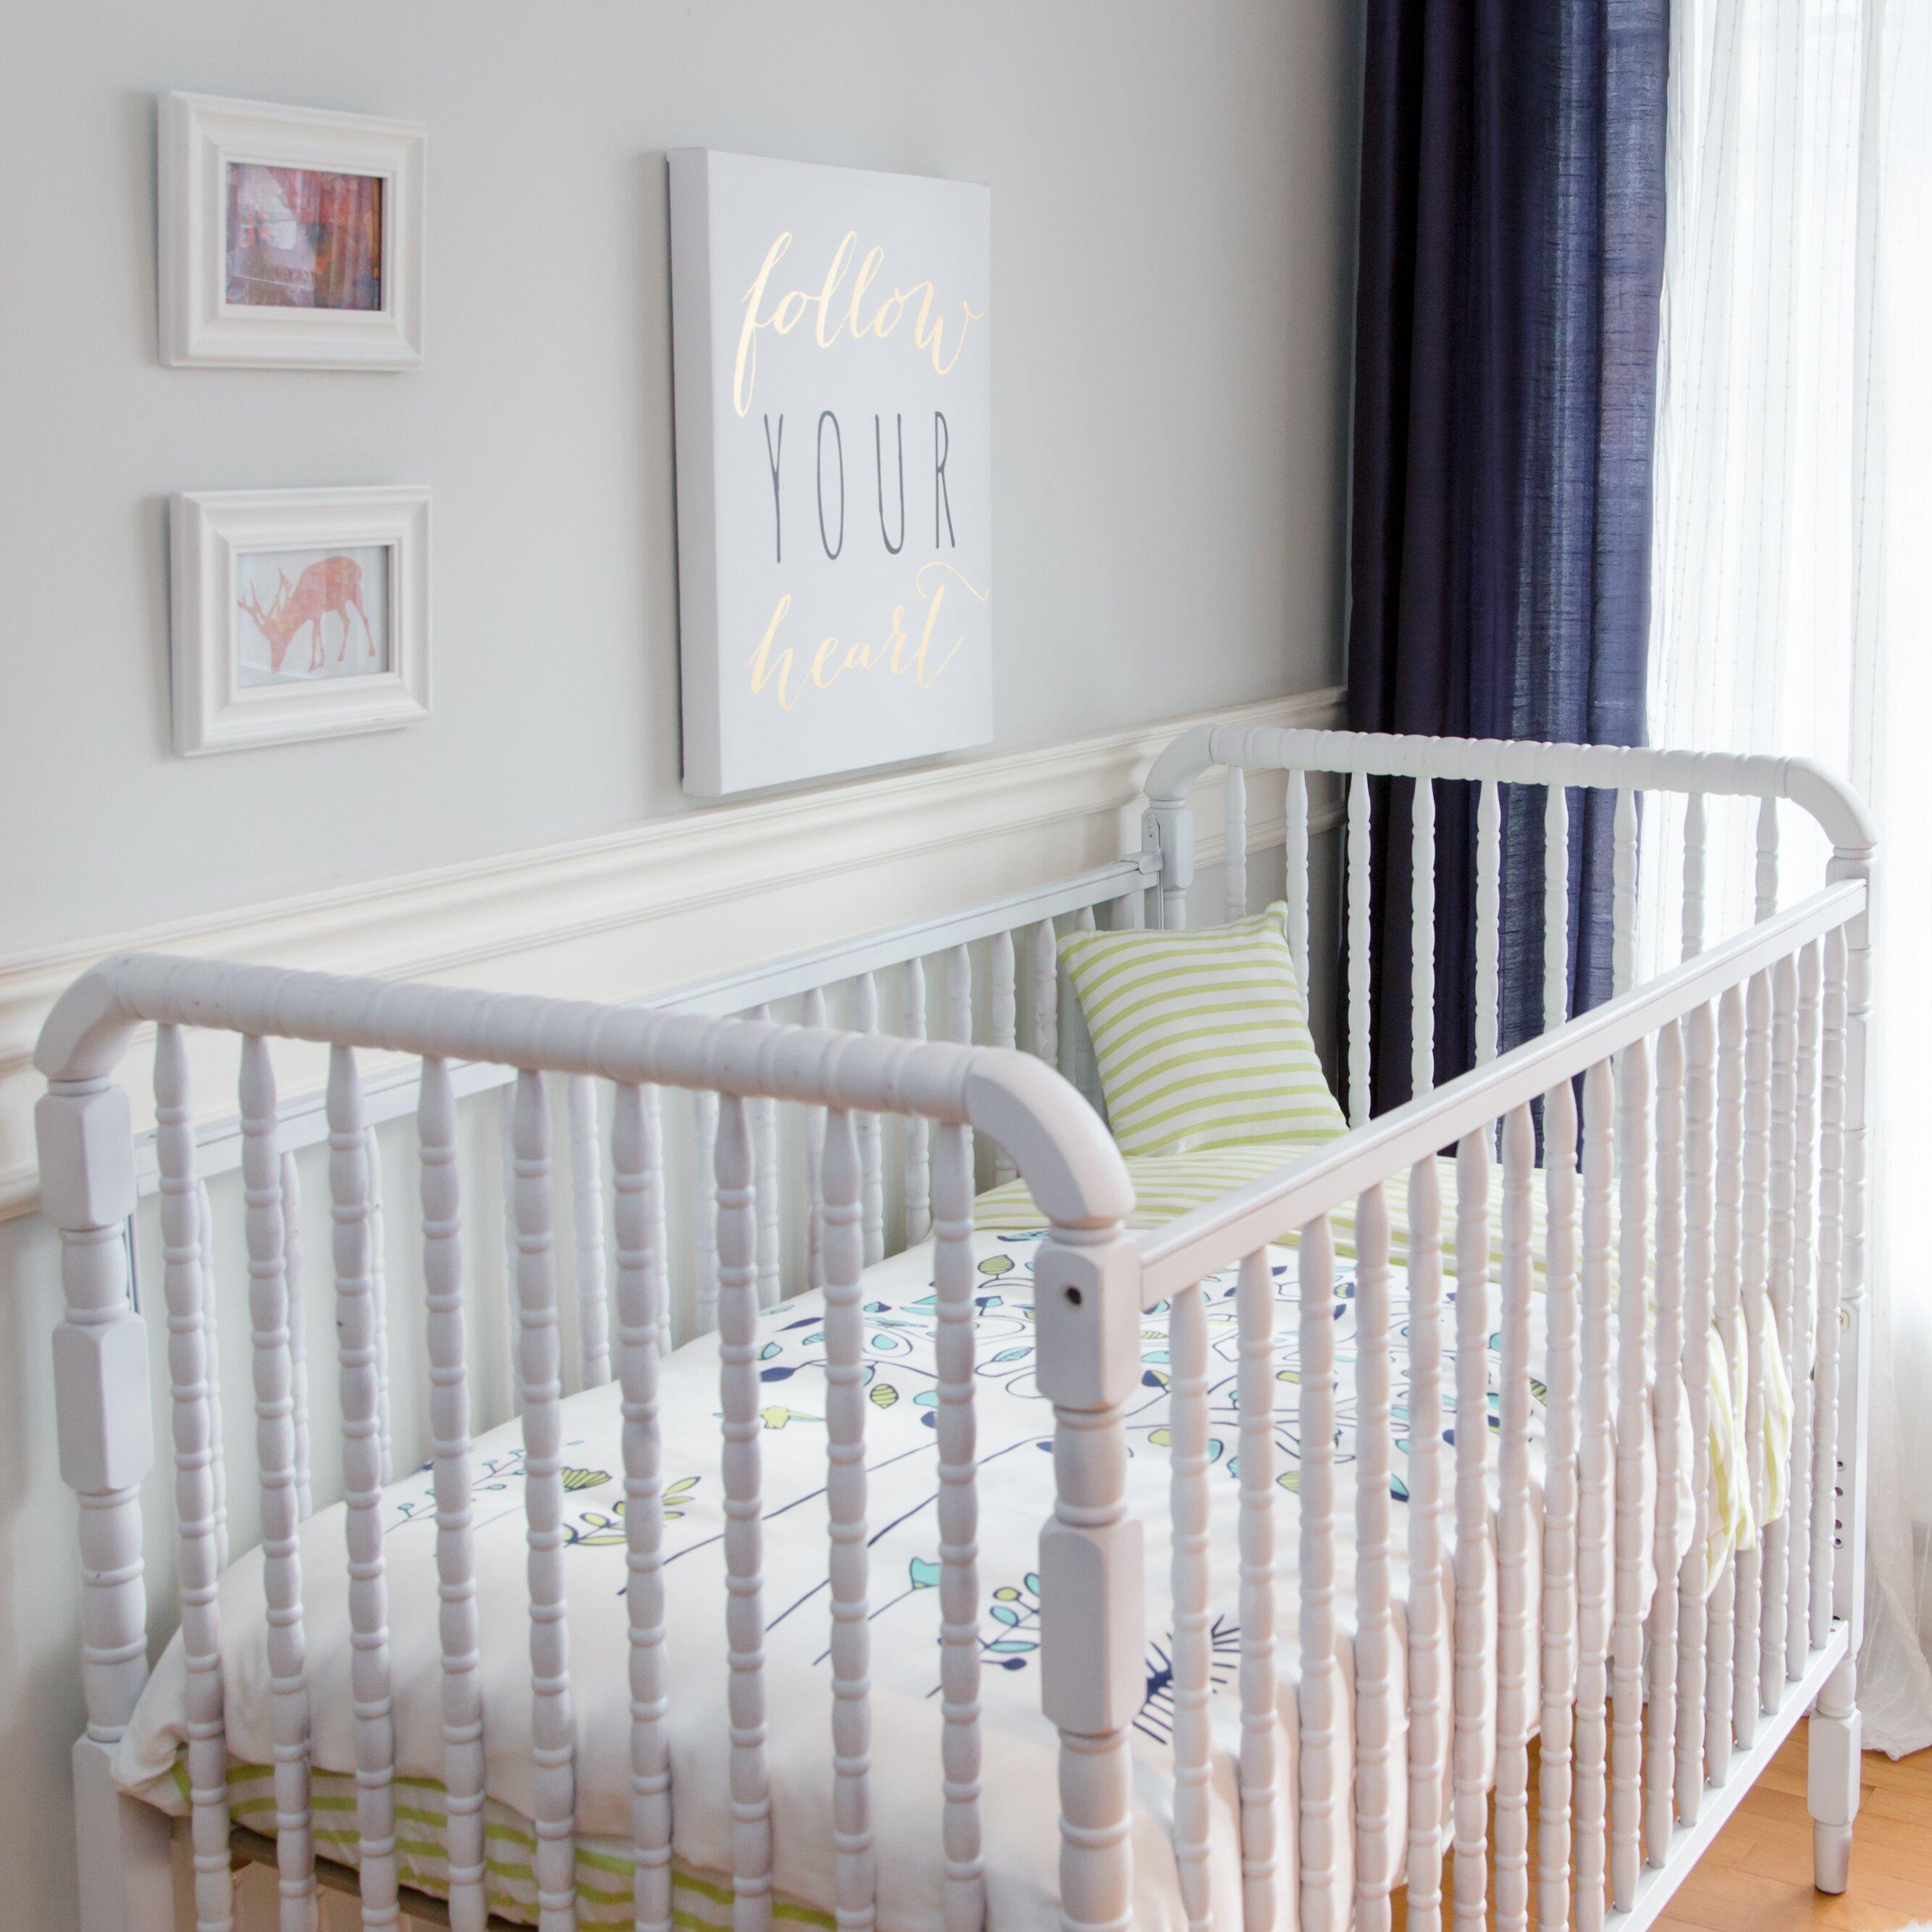 baby crib bedding sets organic  best baby crib inspiration - apple tree organic baby down duvet  piece crib bedding set by atelier